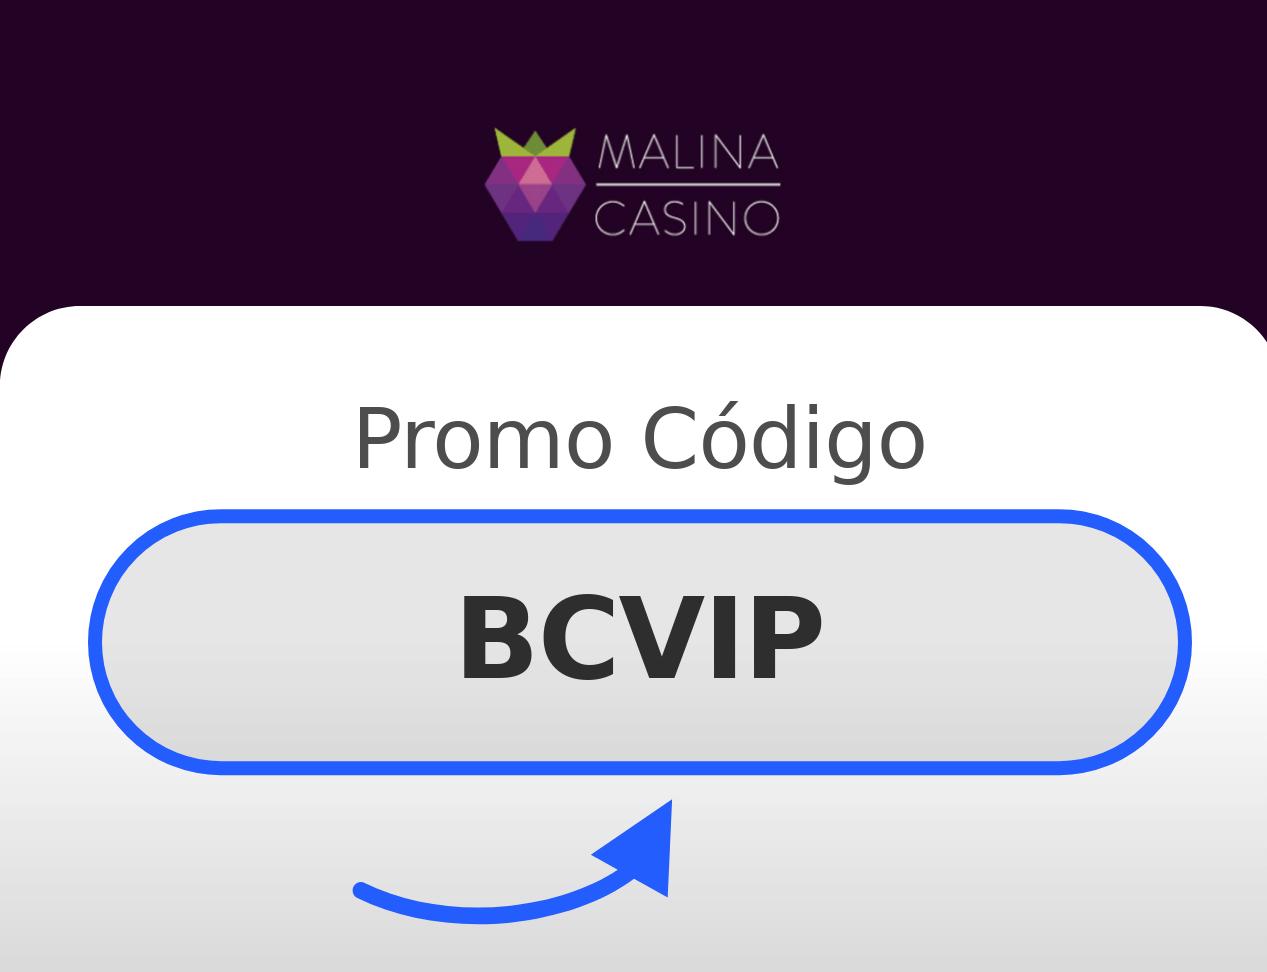 Malina Casino Promo Código